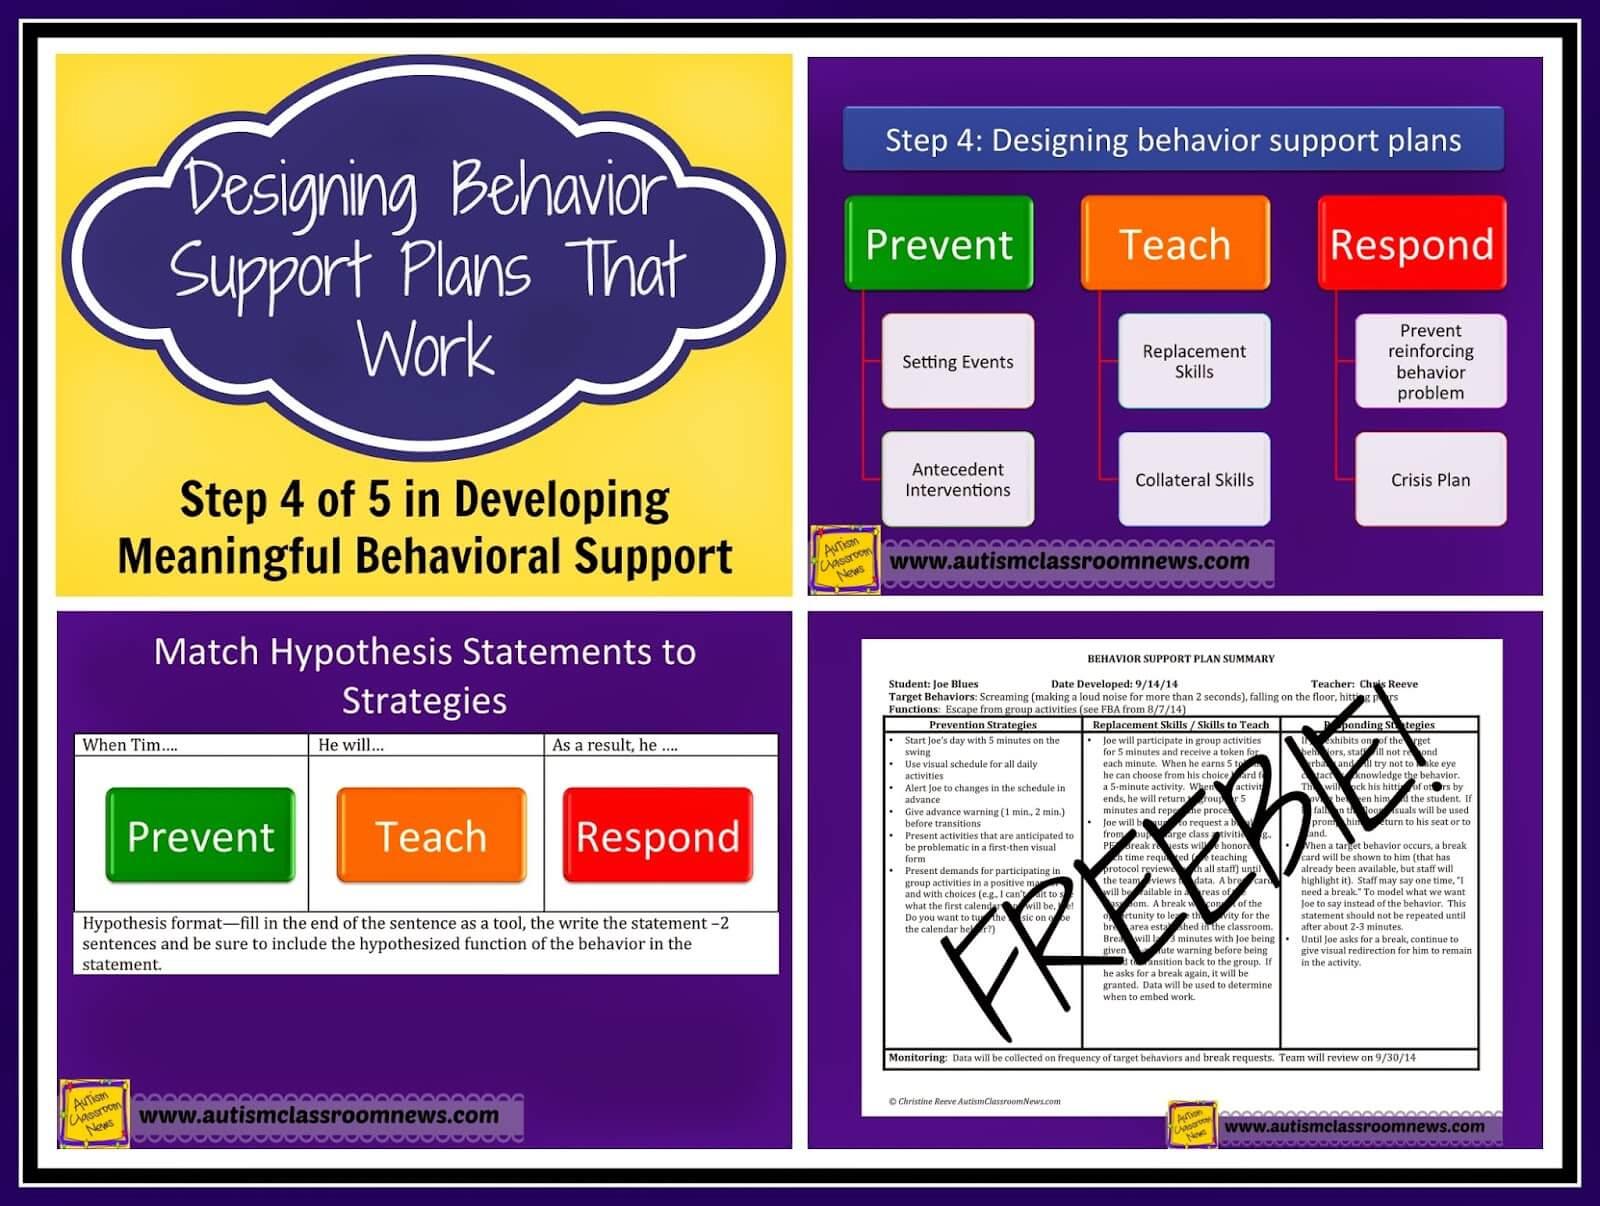 designing behavior support plans that work step 4 of 5 in developing meaningful behavioral. Black Bedroom Furniture Sets. Home Design Ideas